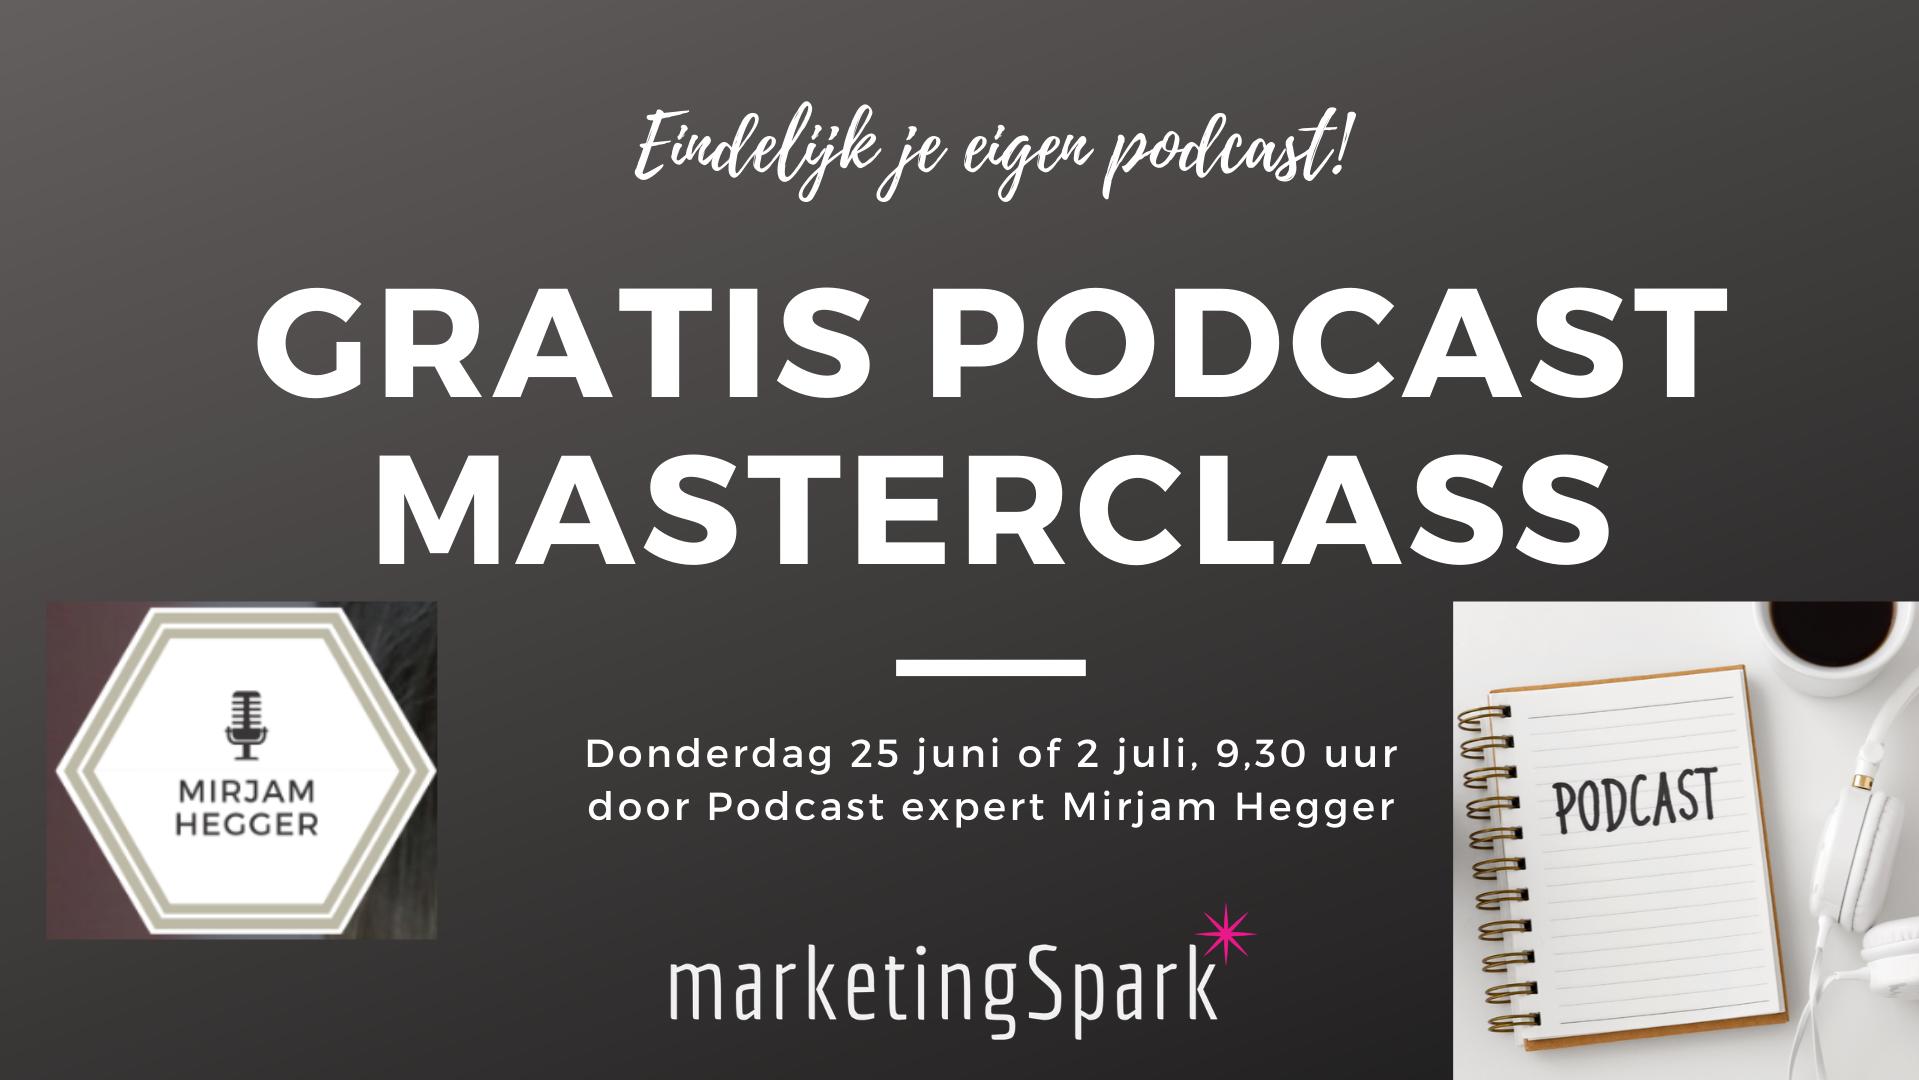 Gratis Podcast Masterclass